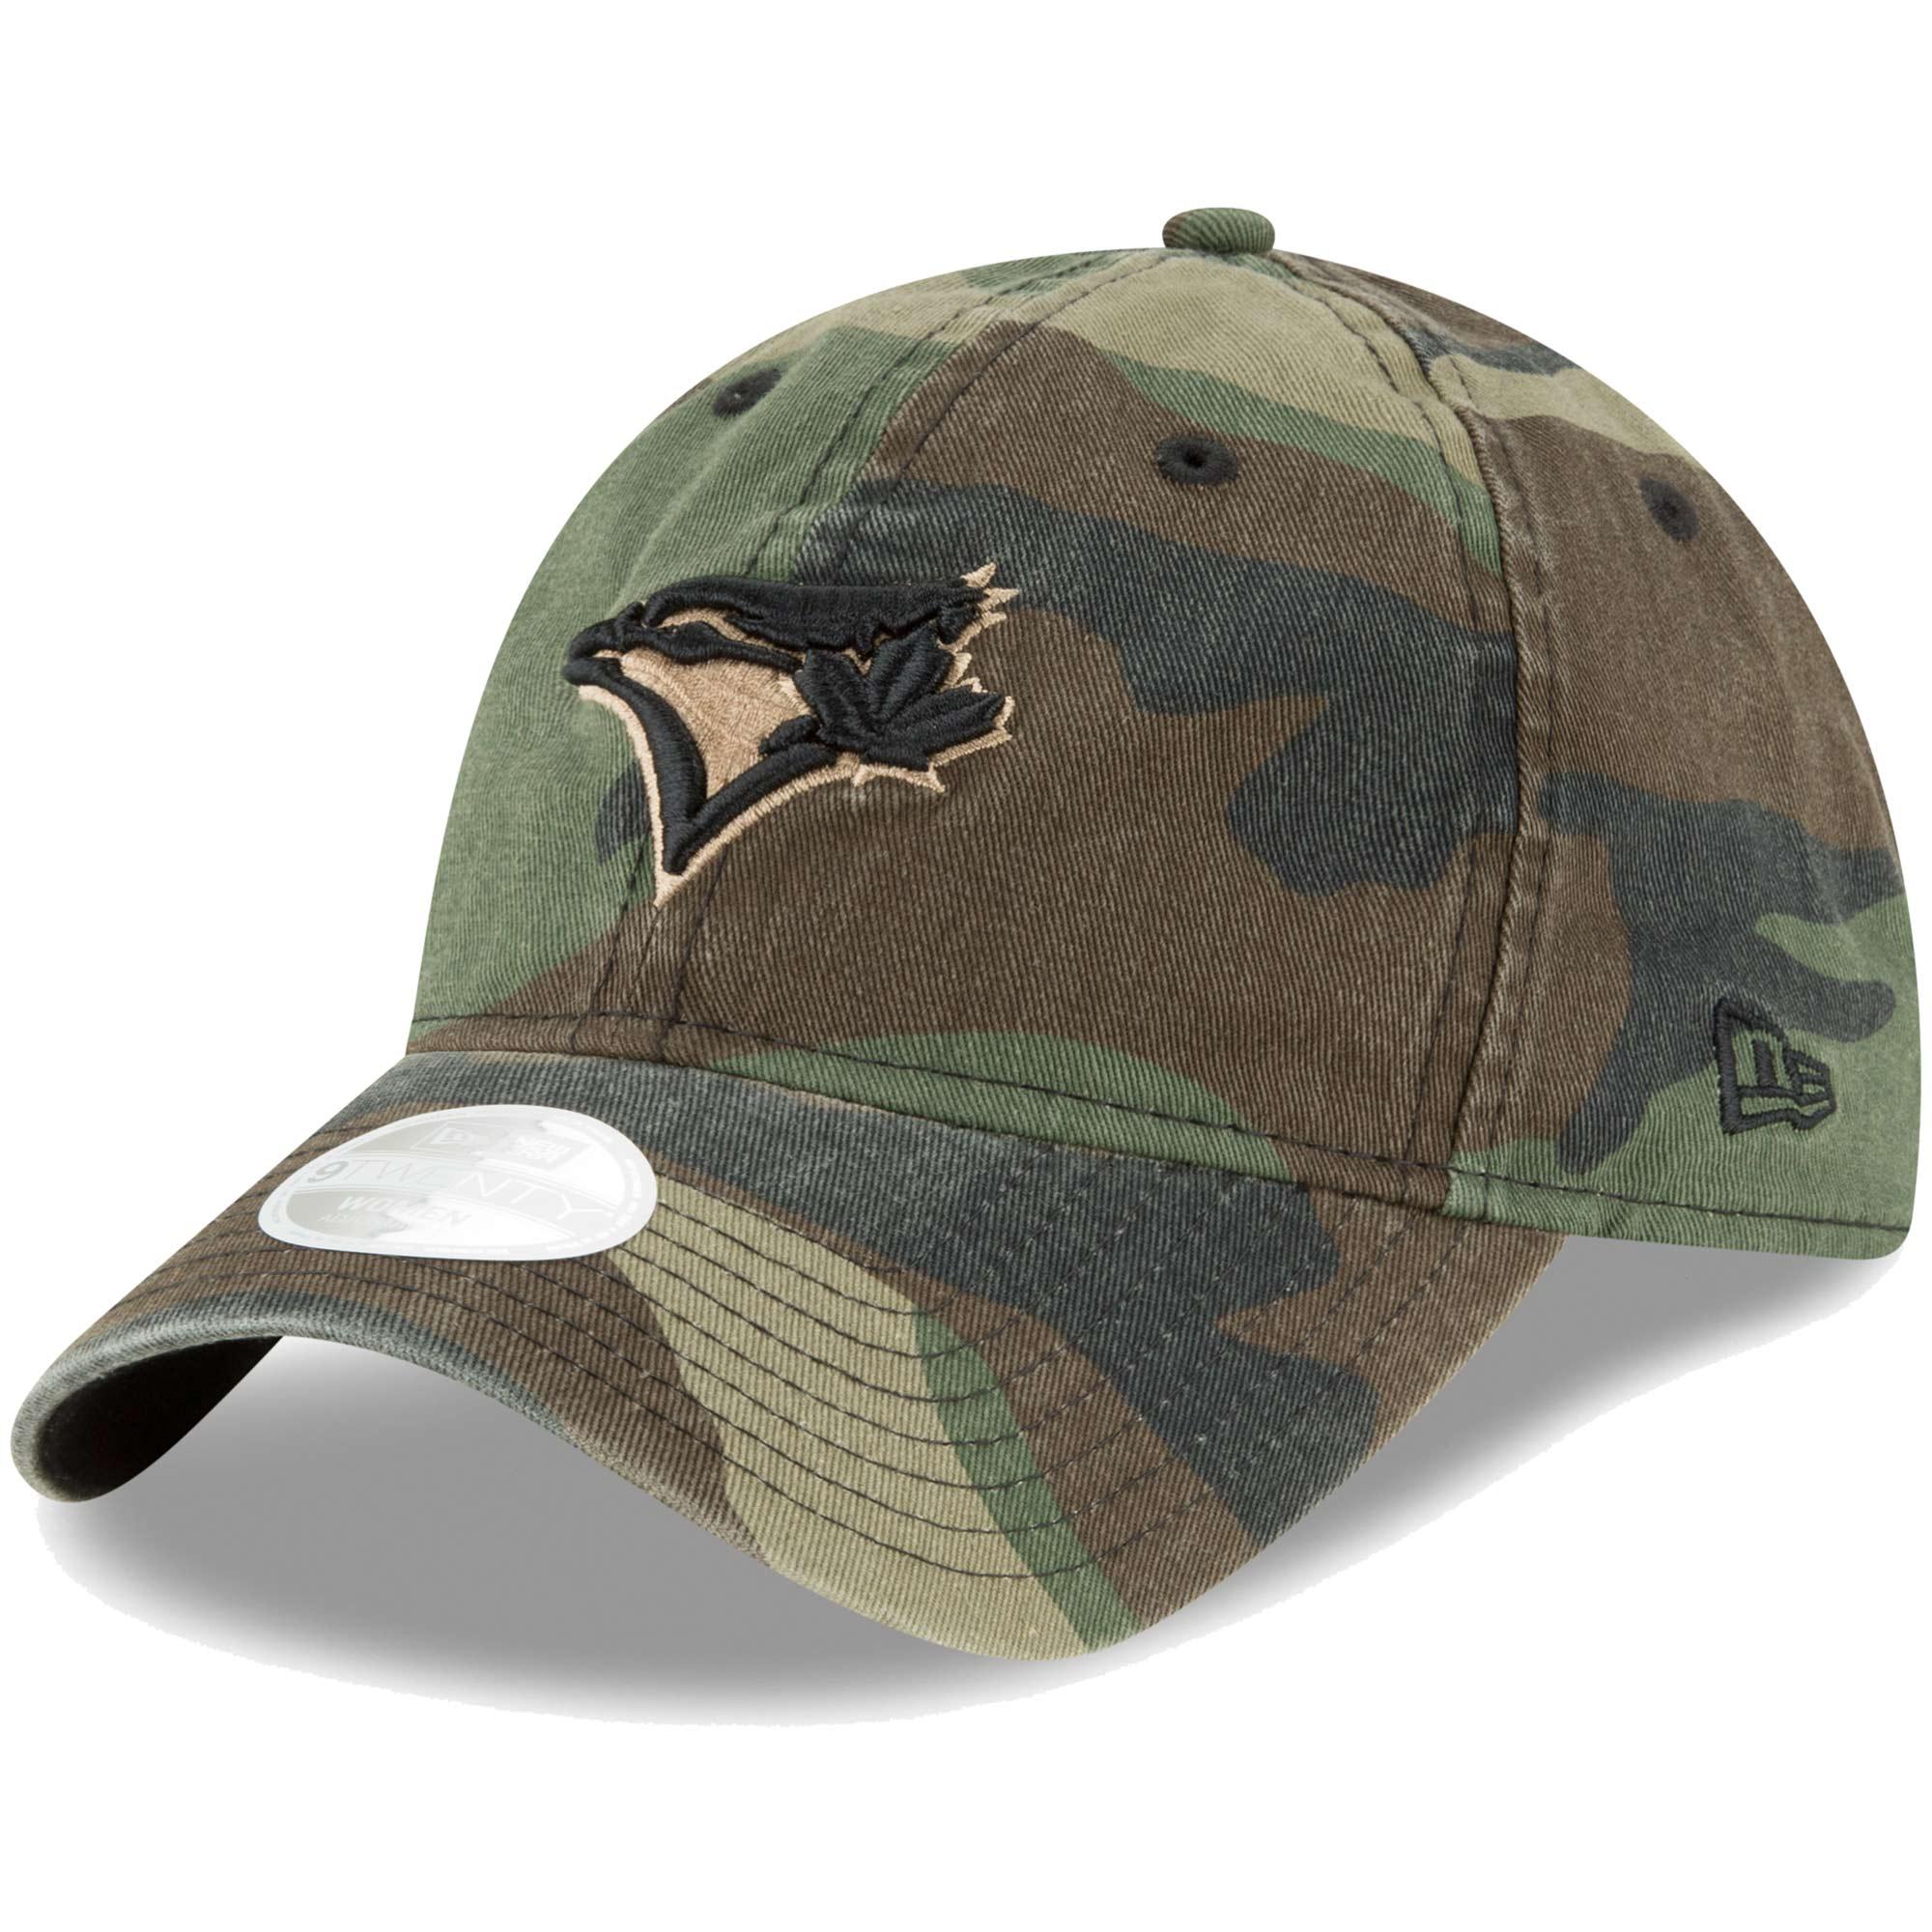 Toronto Blue Jays New Era Women's Core Classic Twill 9TWENTY Adjustable Hat - Camo - OSFA